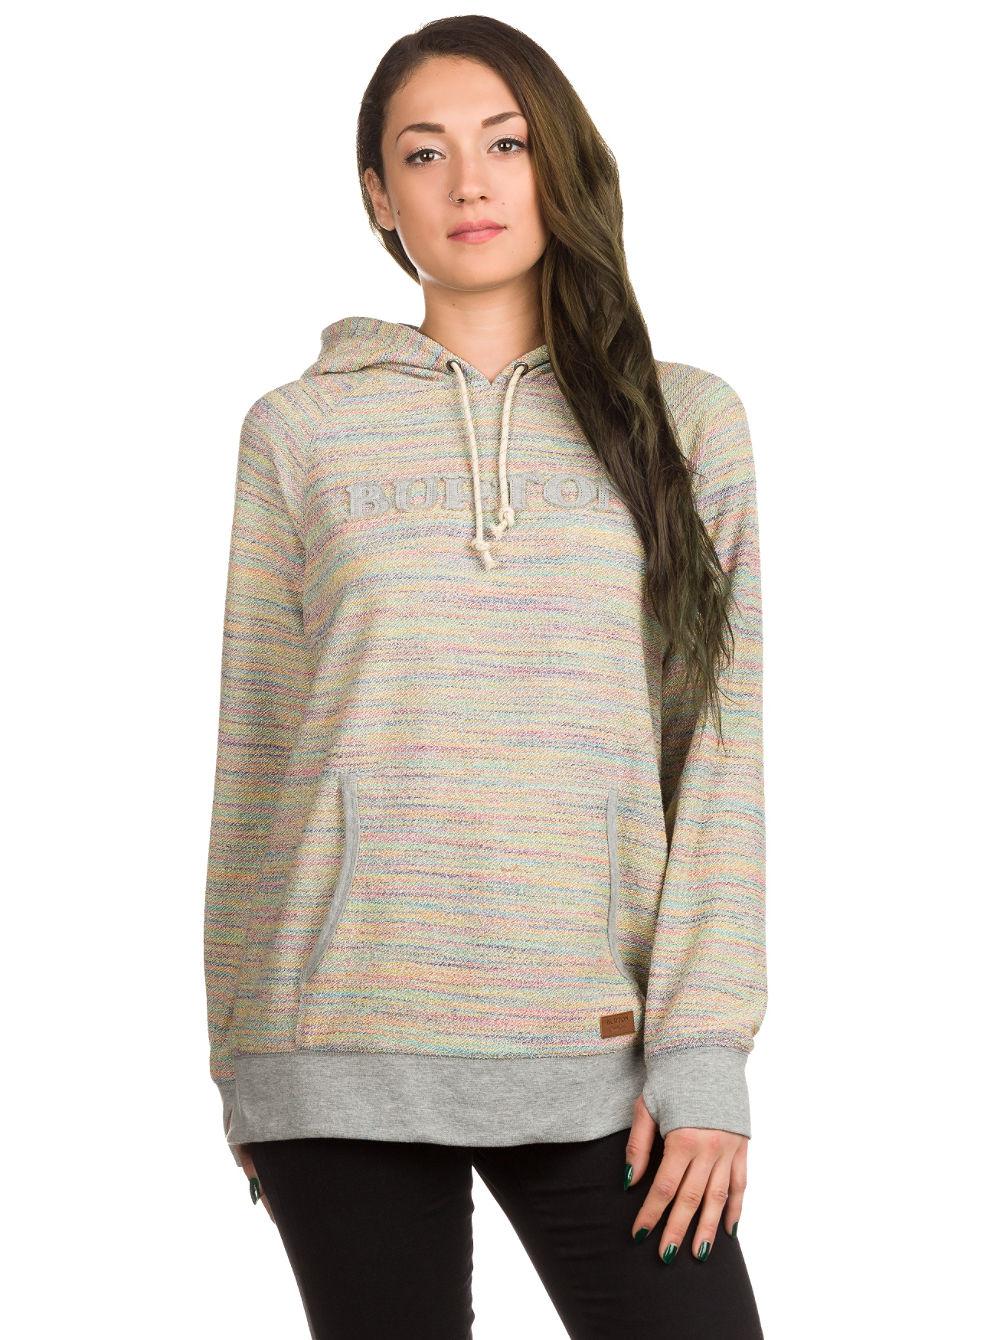 burton-custom-po-hoodie